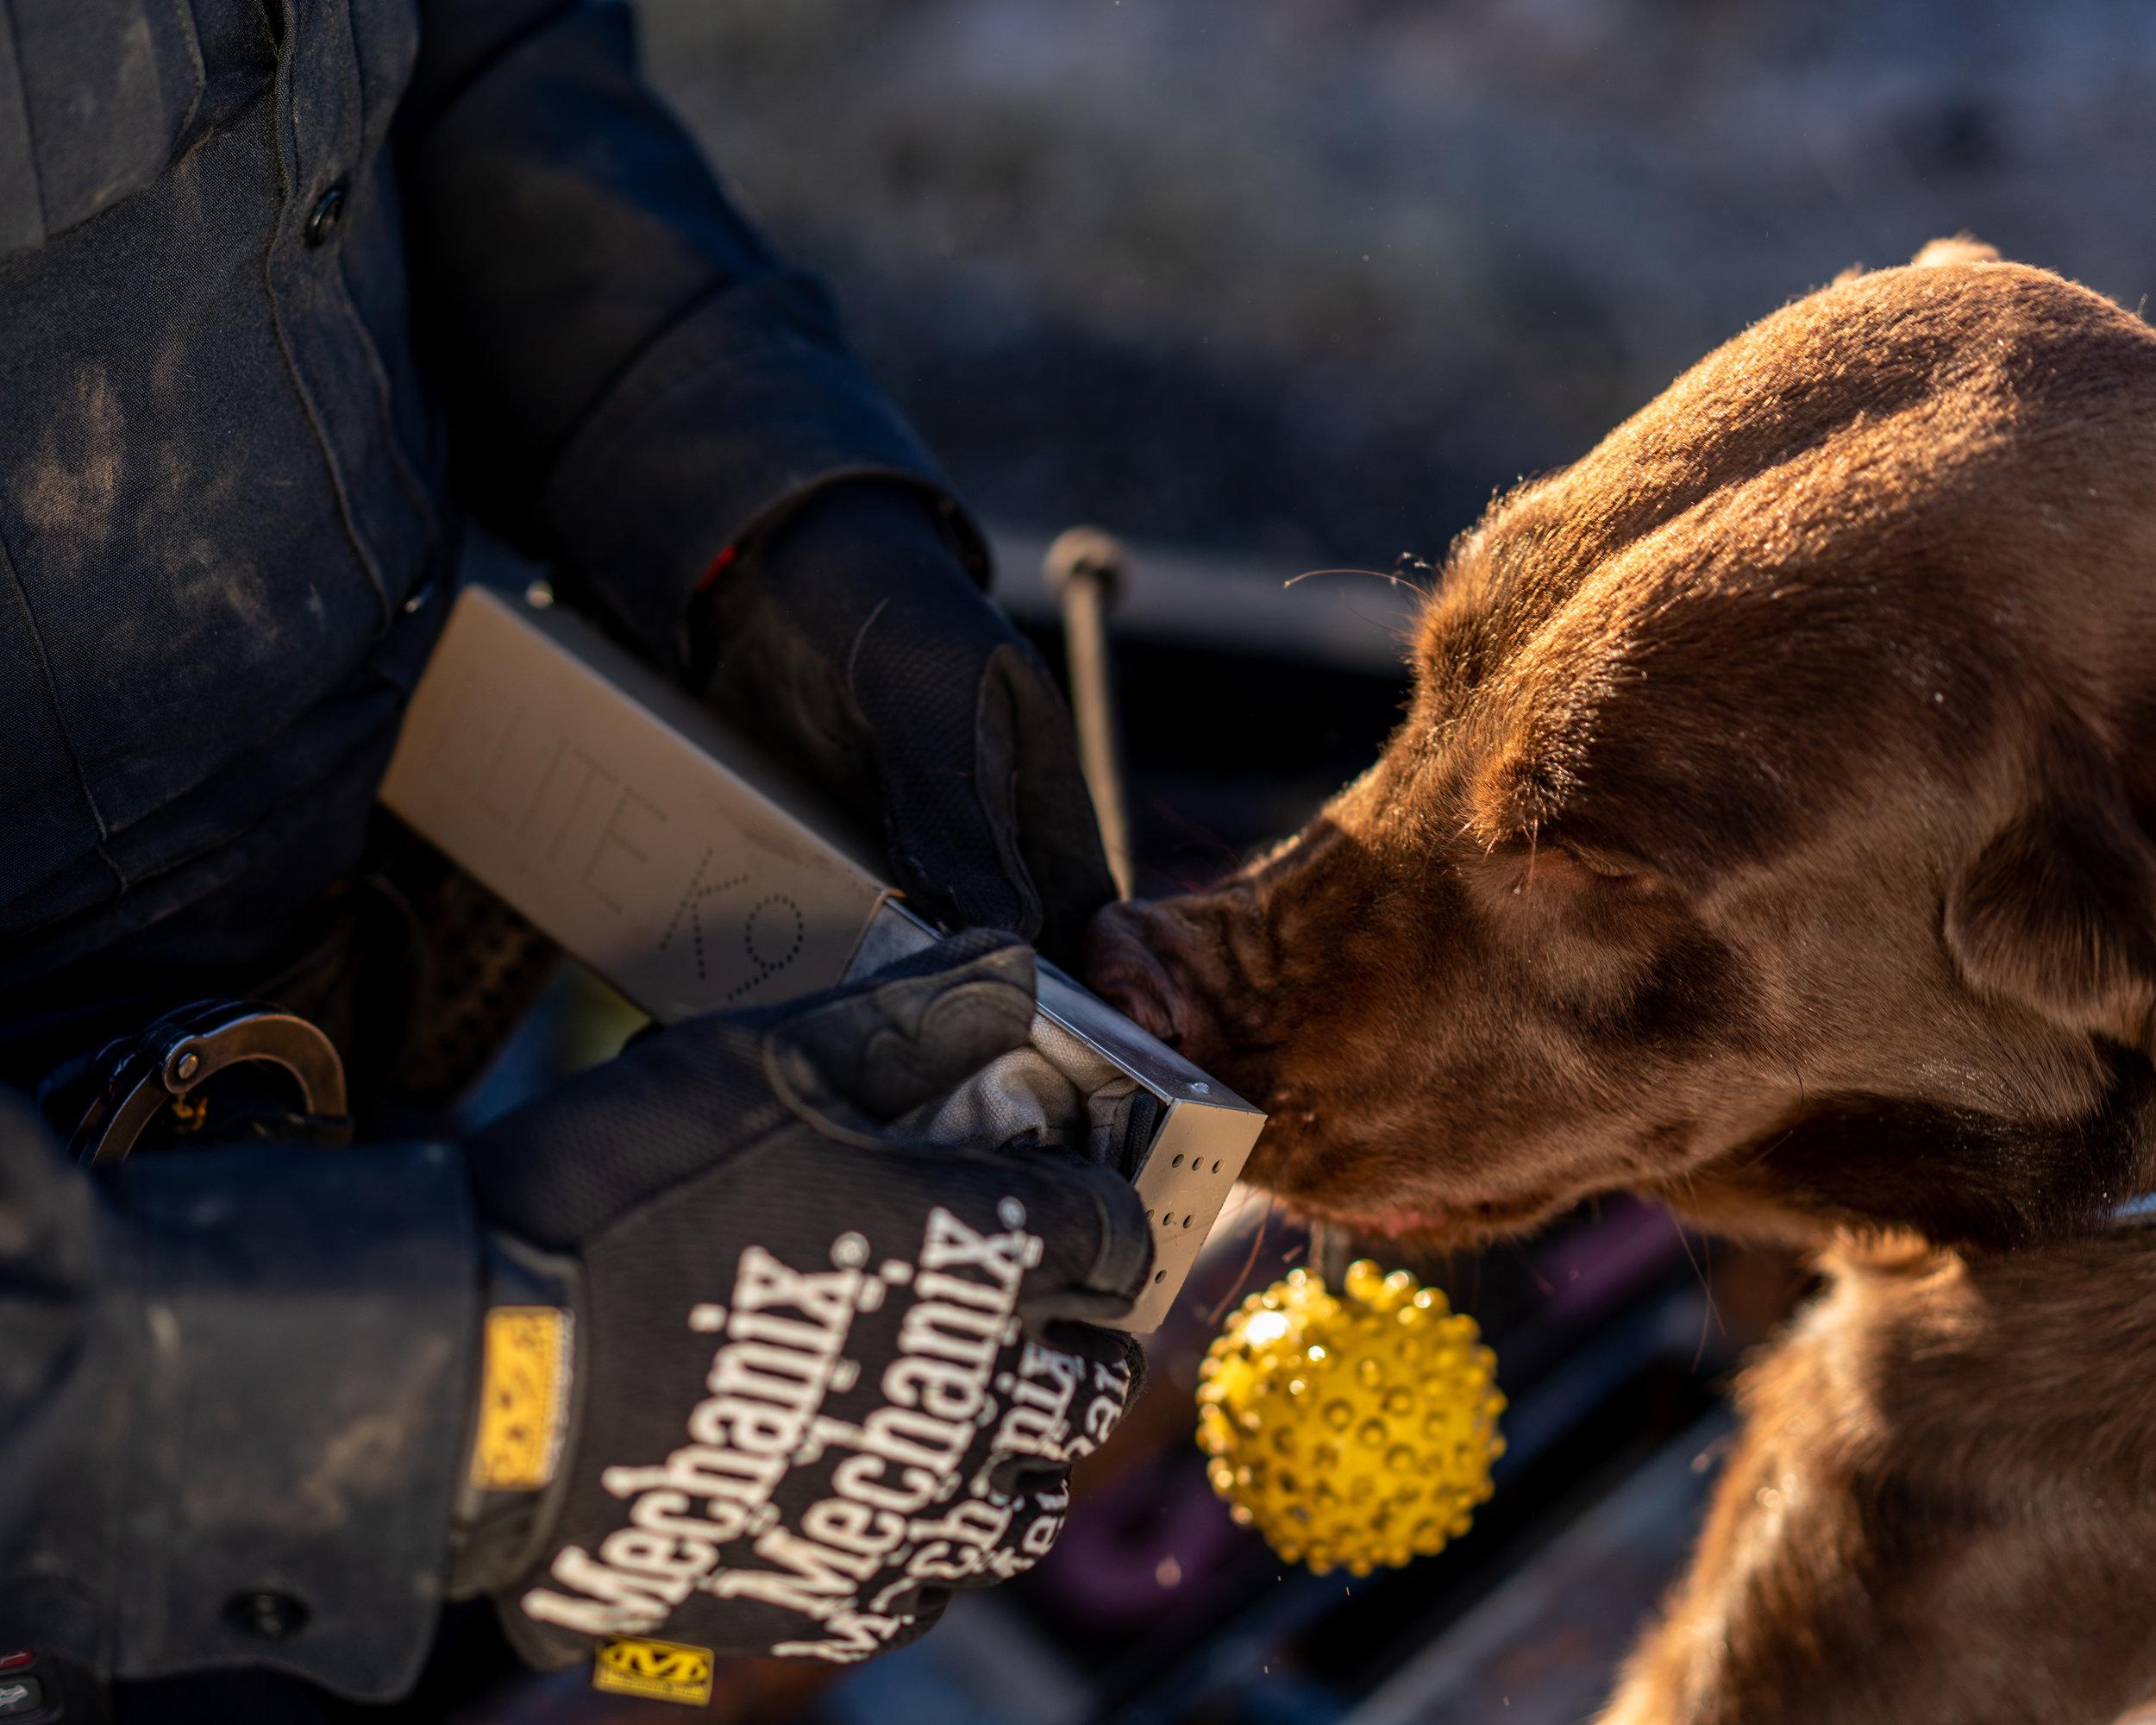 """ Marijuana Legalization Threatens These Dogs' Collars "" Role: Producer, assigning photo editor Photographer: Ryan David Brown"